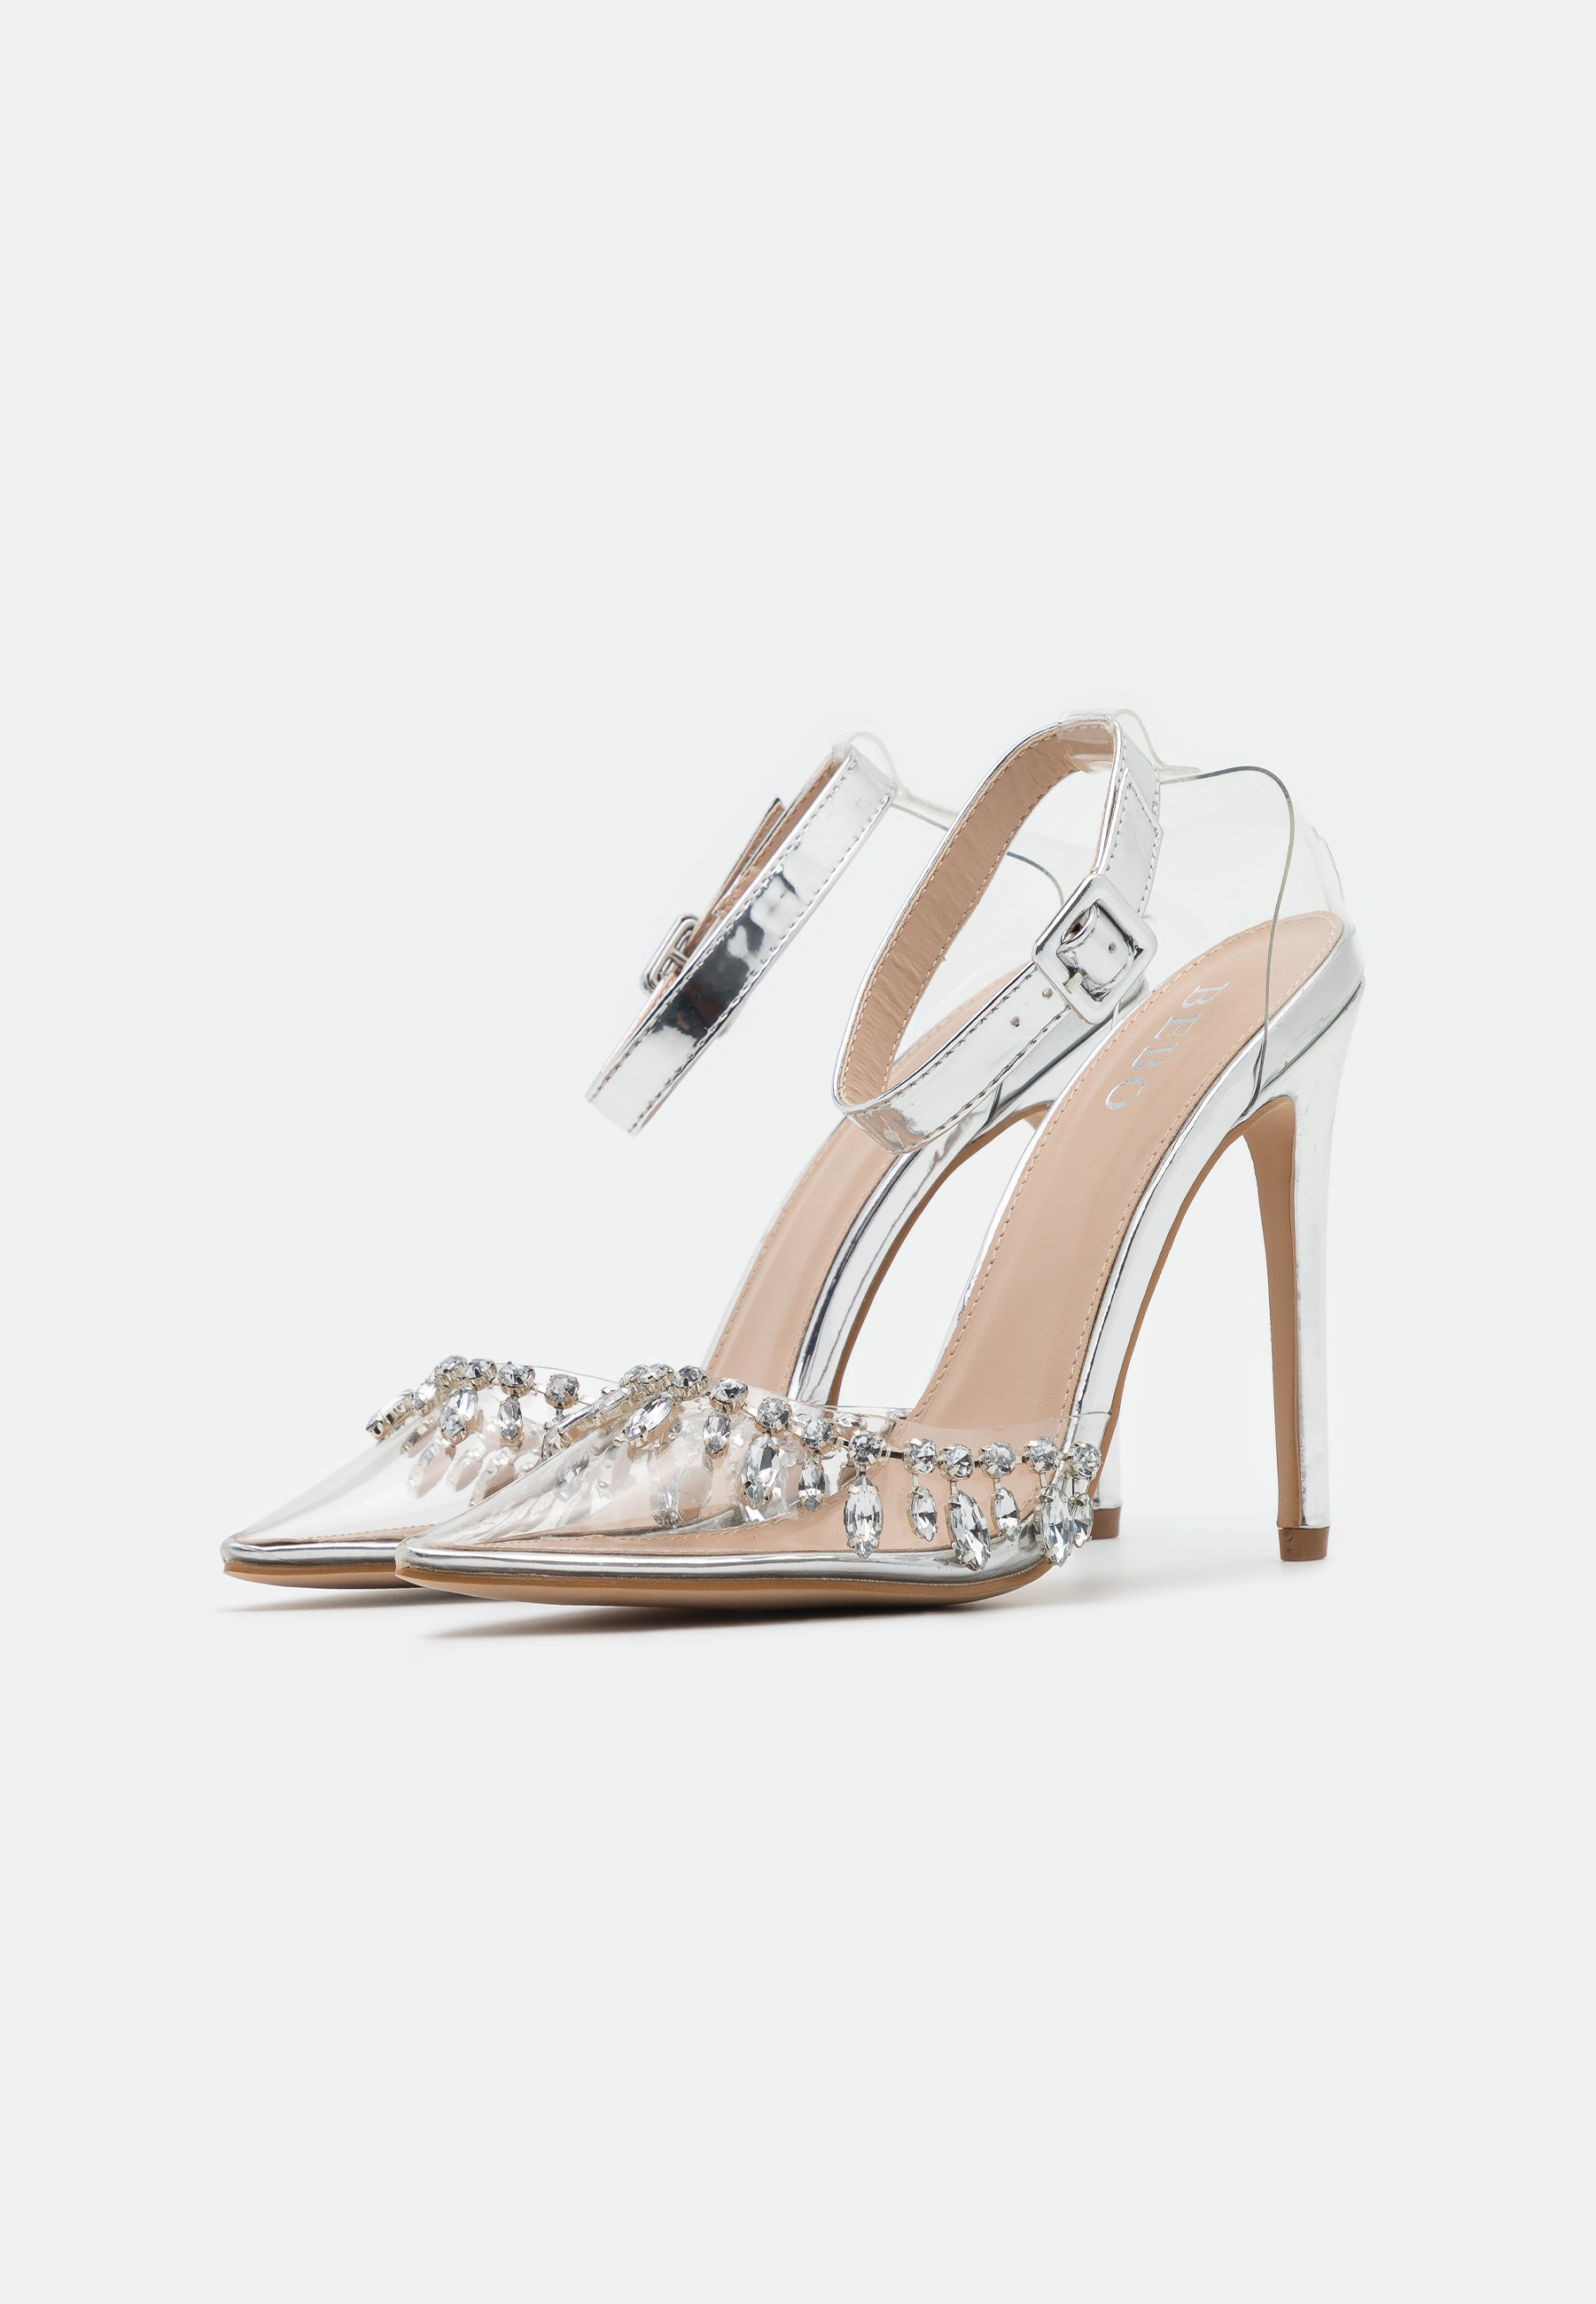 BEBO RASSEL High Heel Pumps clear/silver/silber